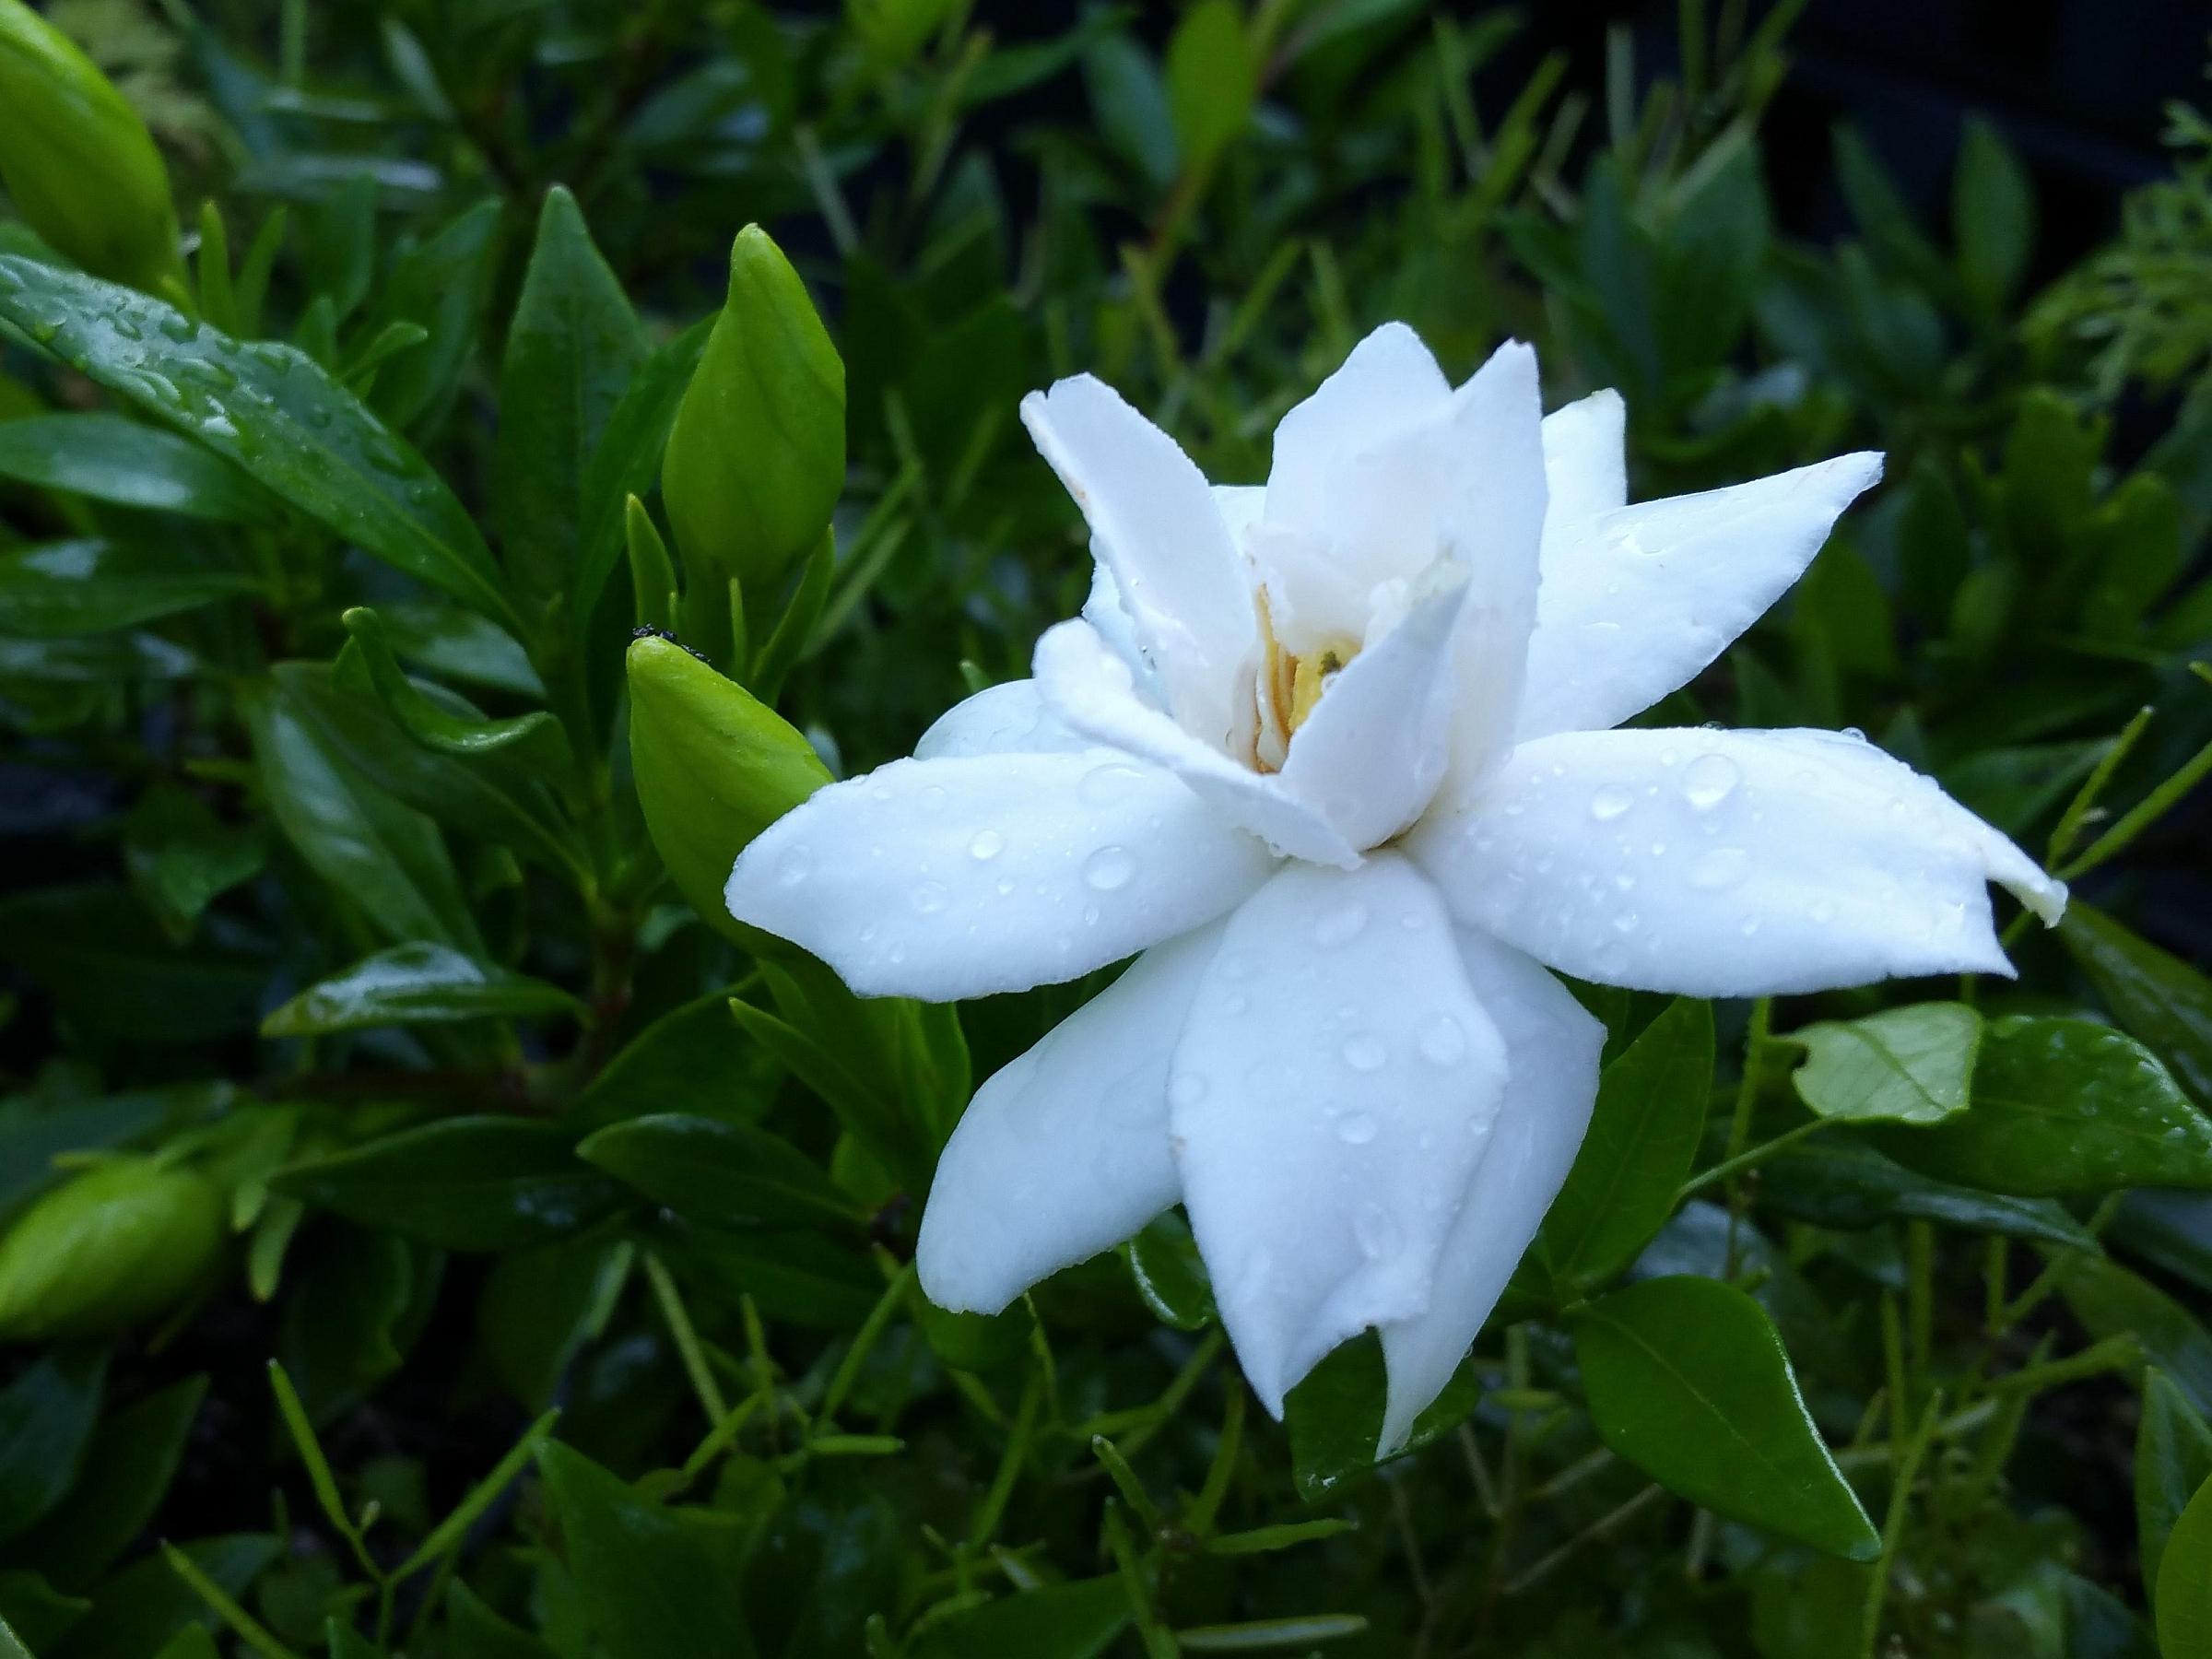 Dwarf Radicans Miniature Gardenia Live Plant Low Grower Fragrant